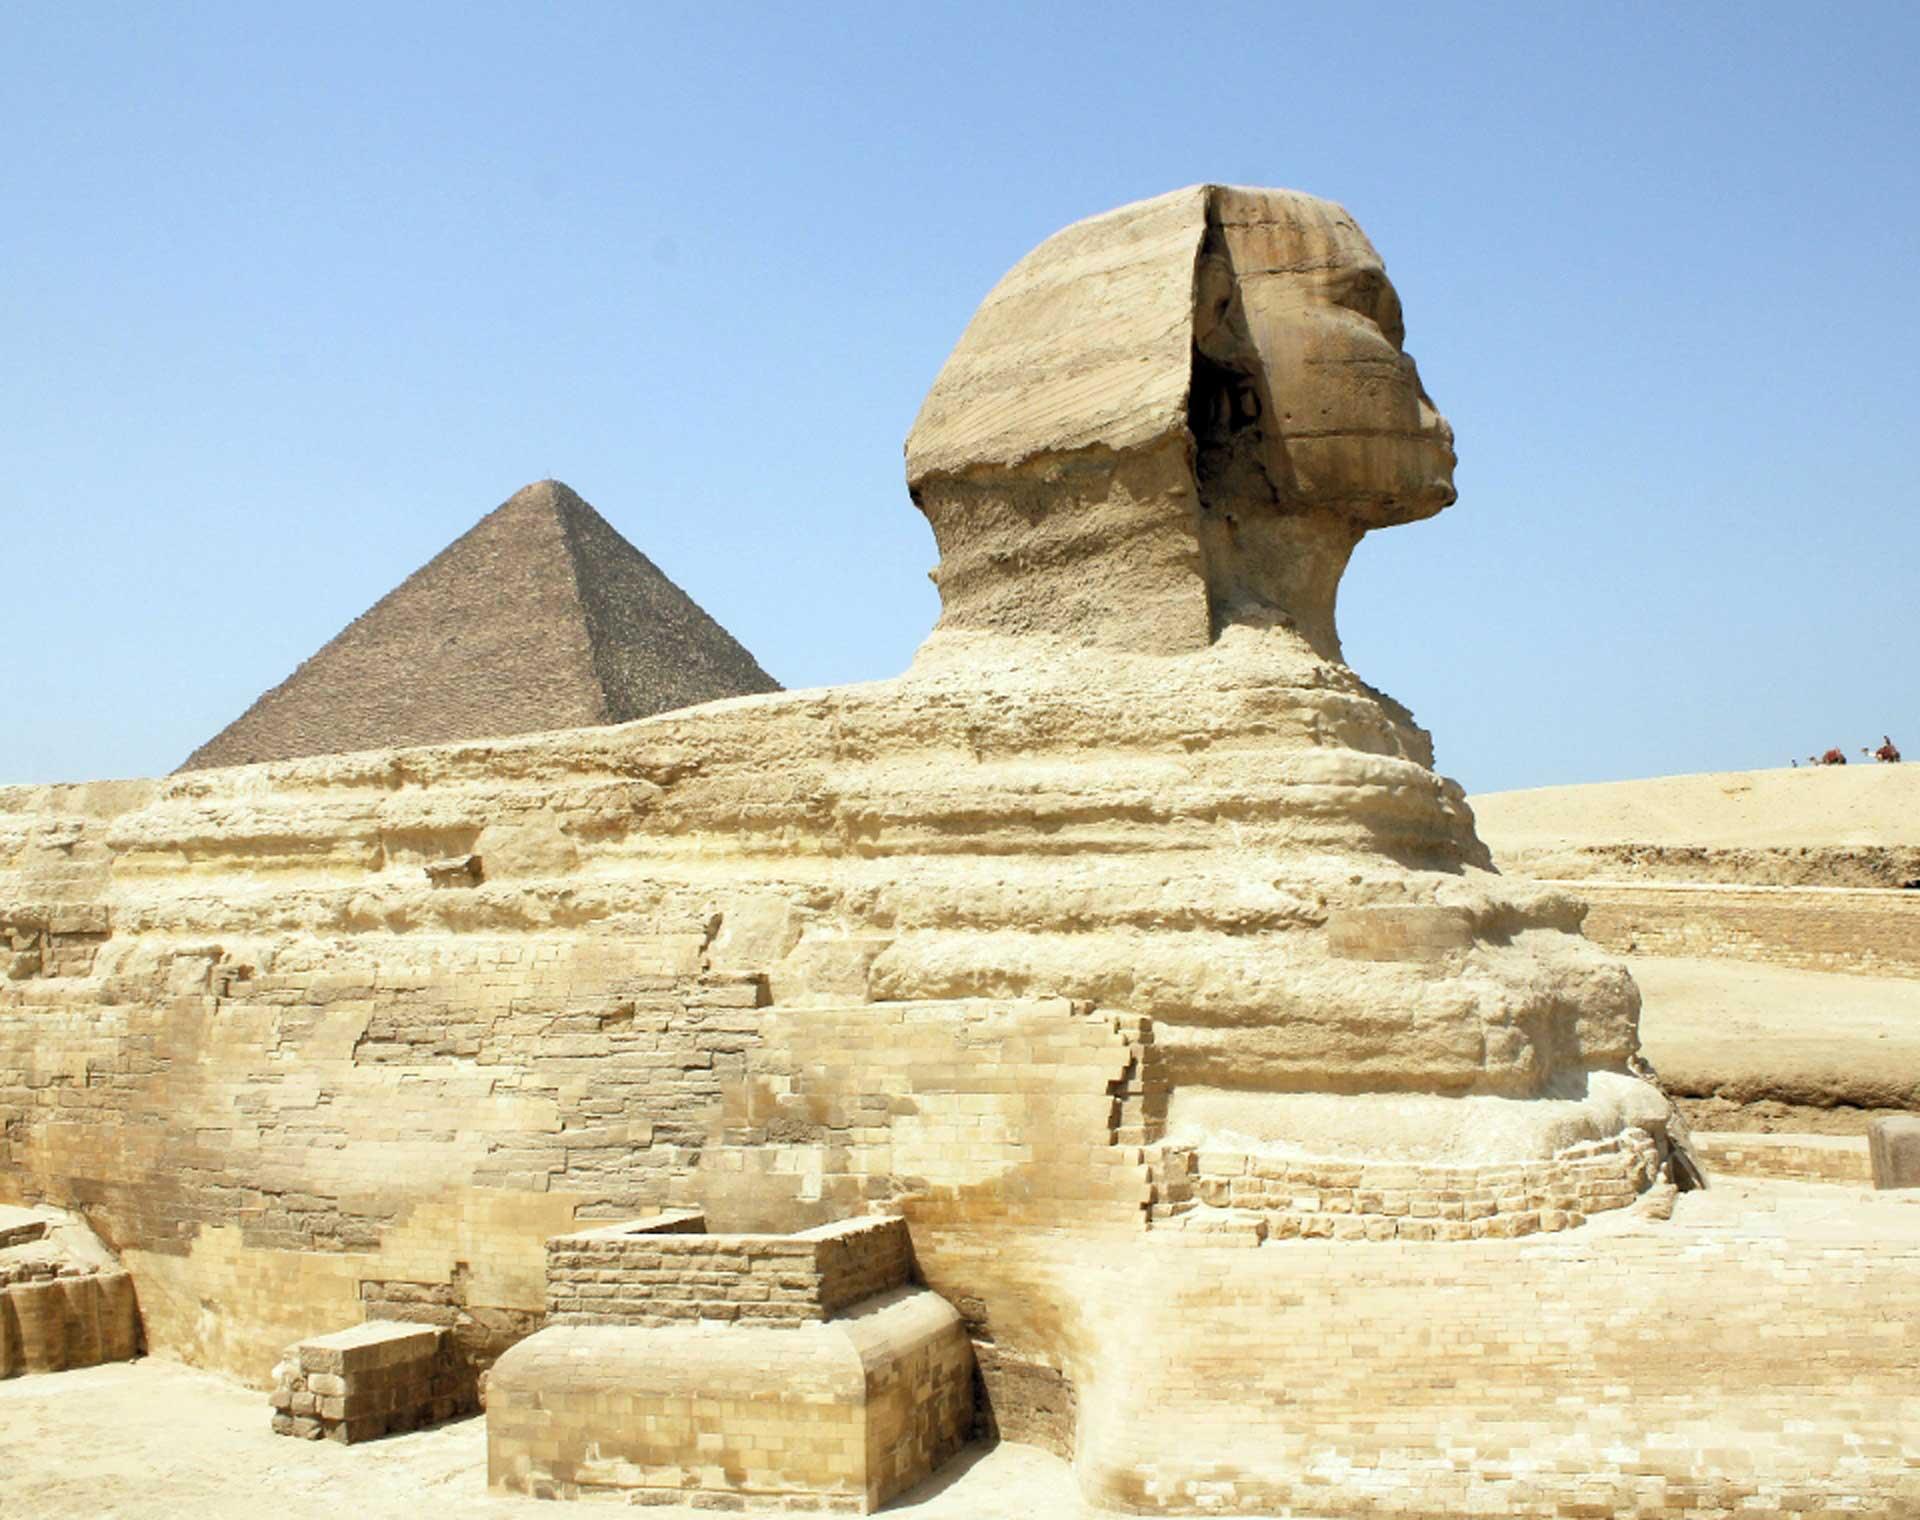 Barabar-BAM-film-granit-miroir-pyramide-sphinx-gizeh-1920-1520